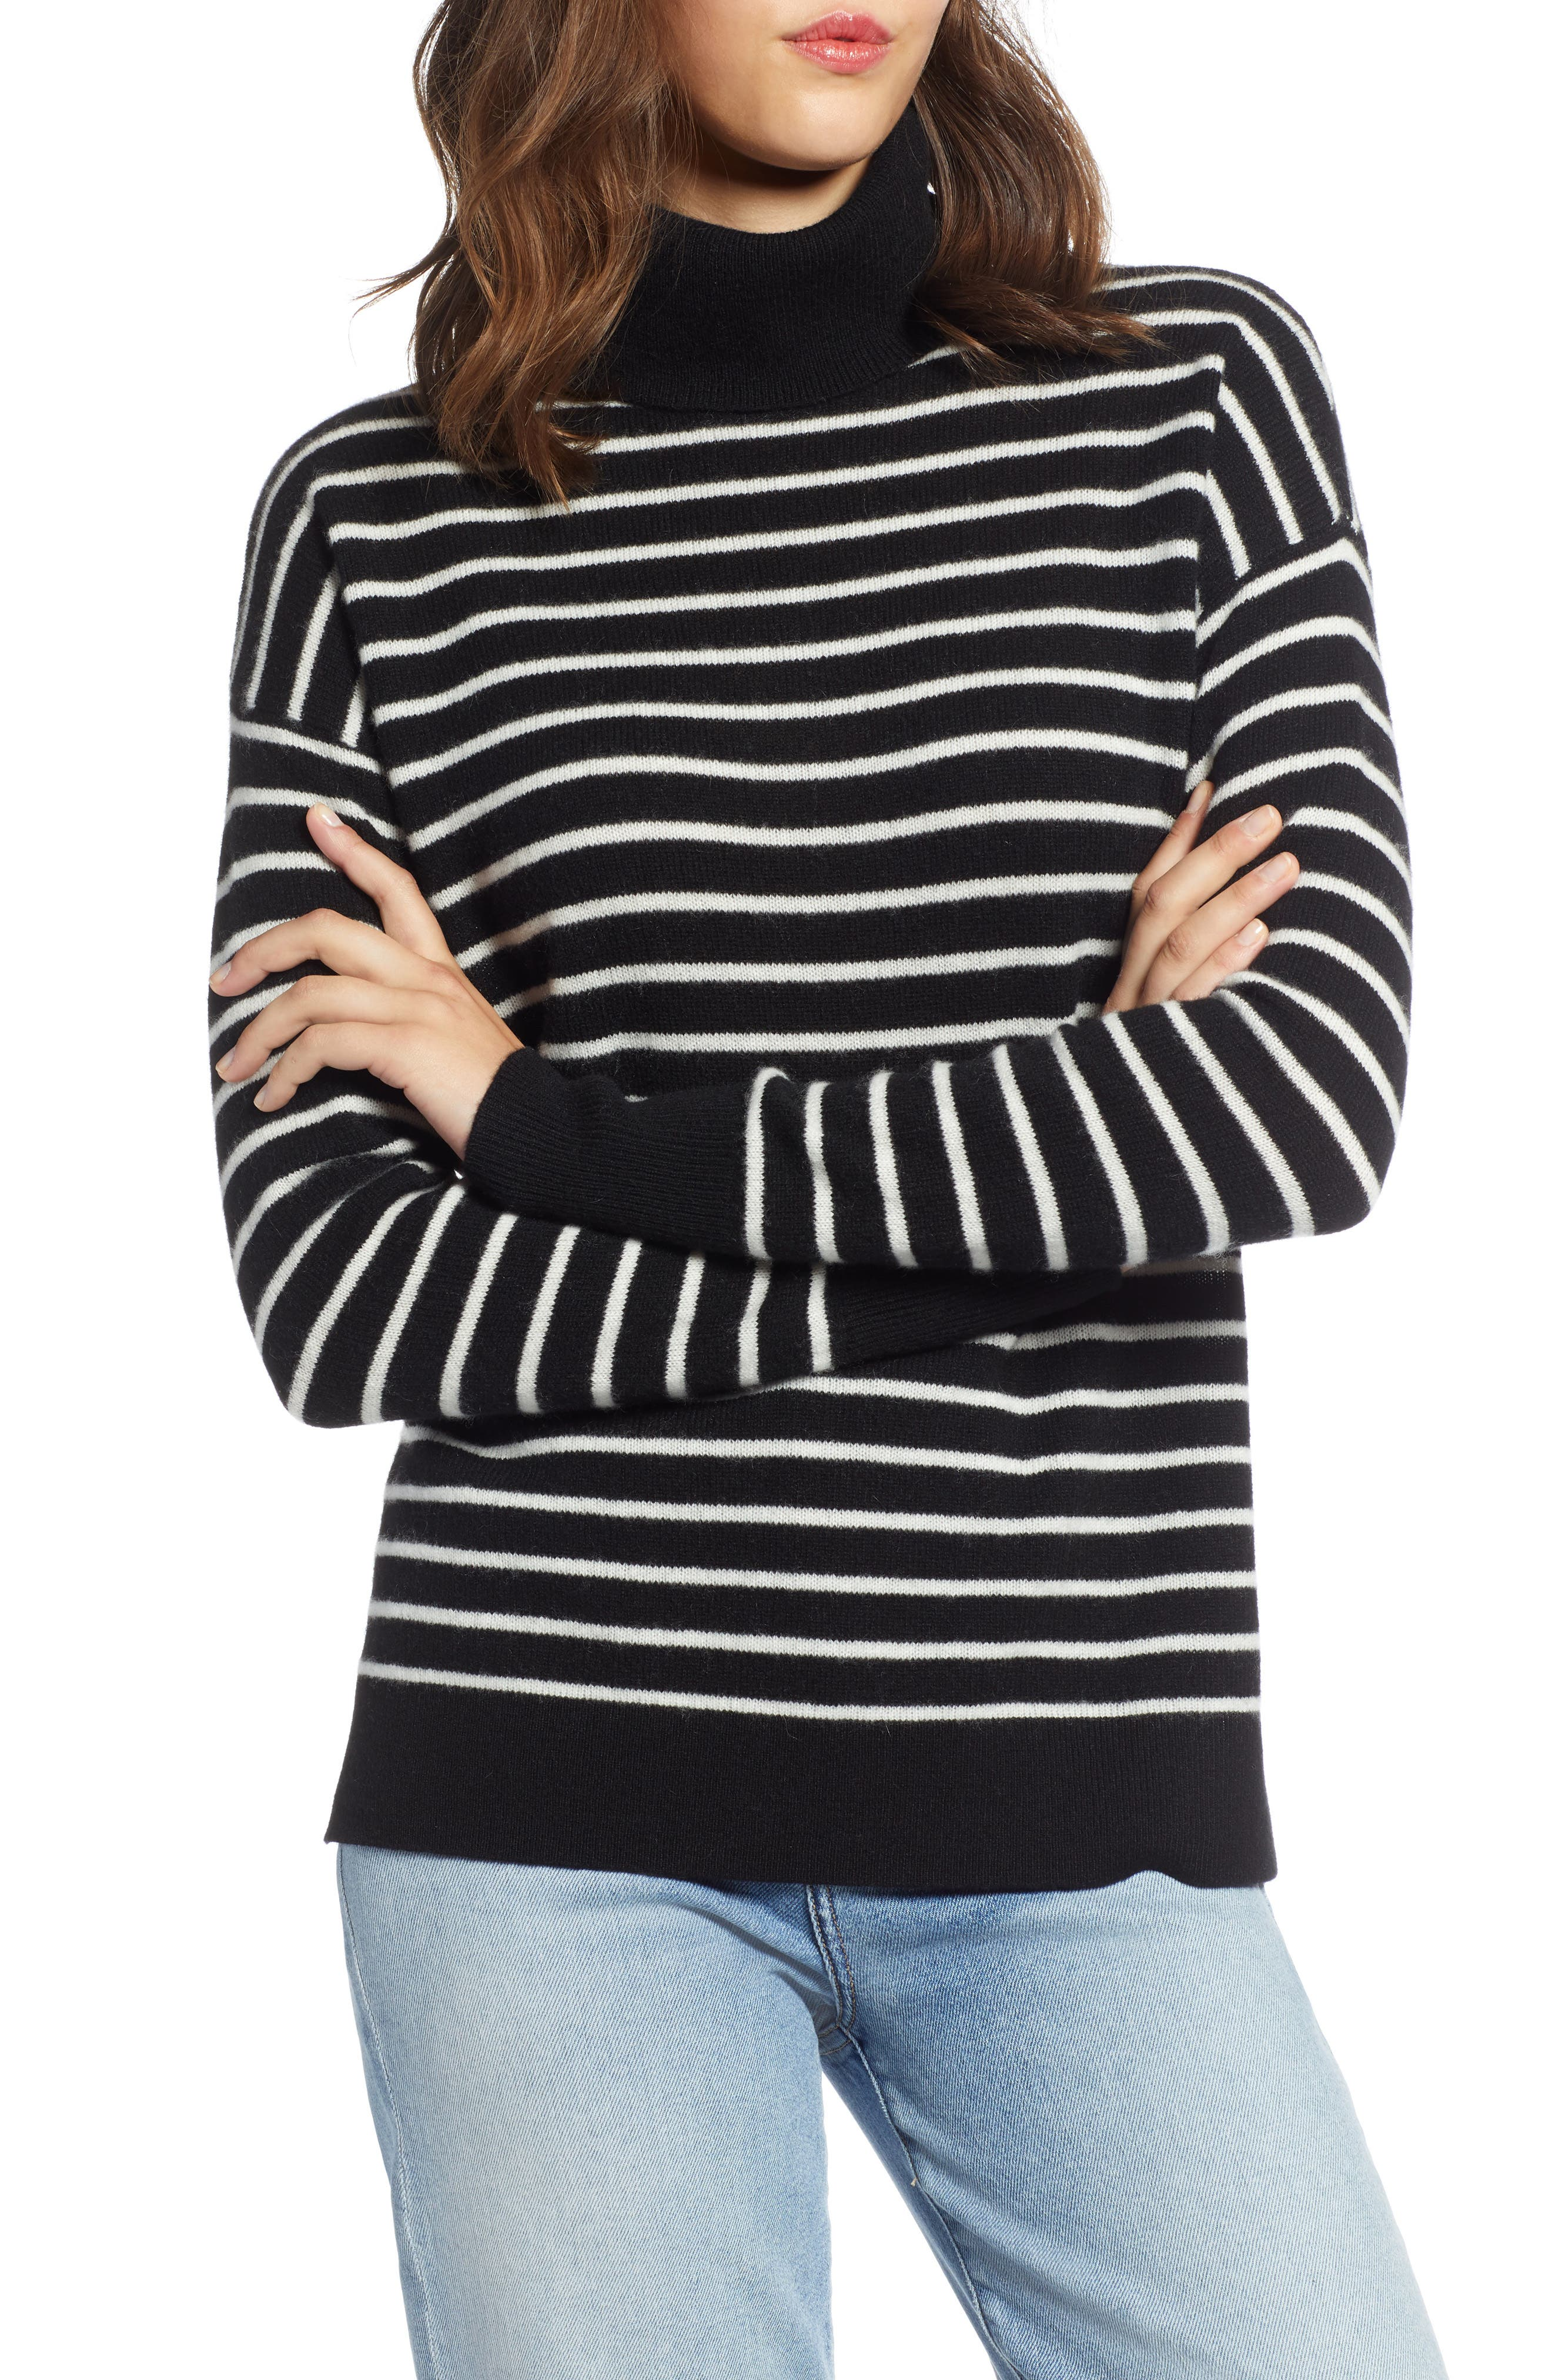 Cashmere Turtleneck Sweater,                         Main,                         color, BLACK- IVORY STRIPE